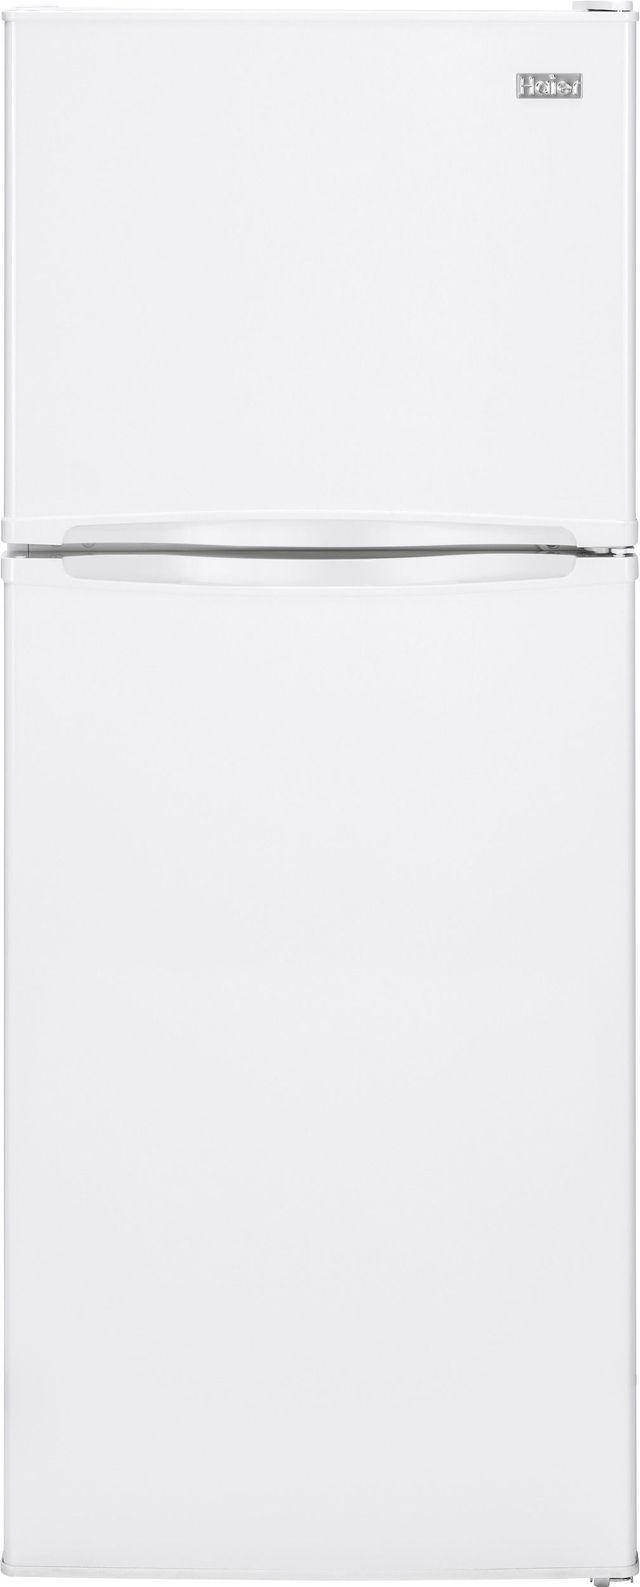 Haier 9.81 Cu. Ft. White Top Freezer Refrigerator-HA10TG21SW